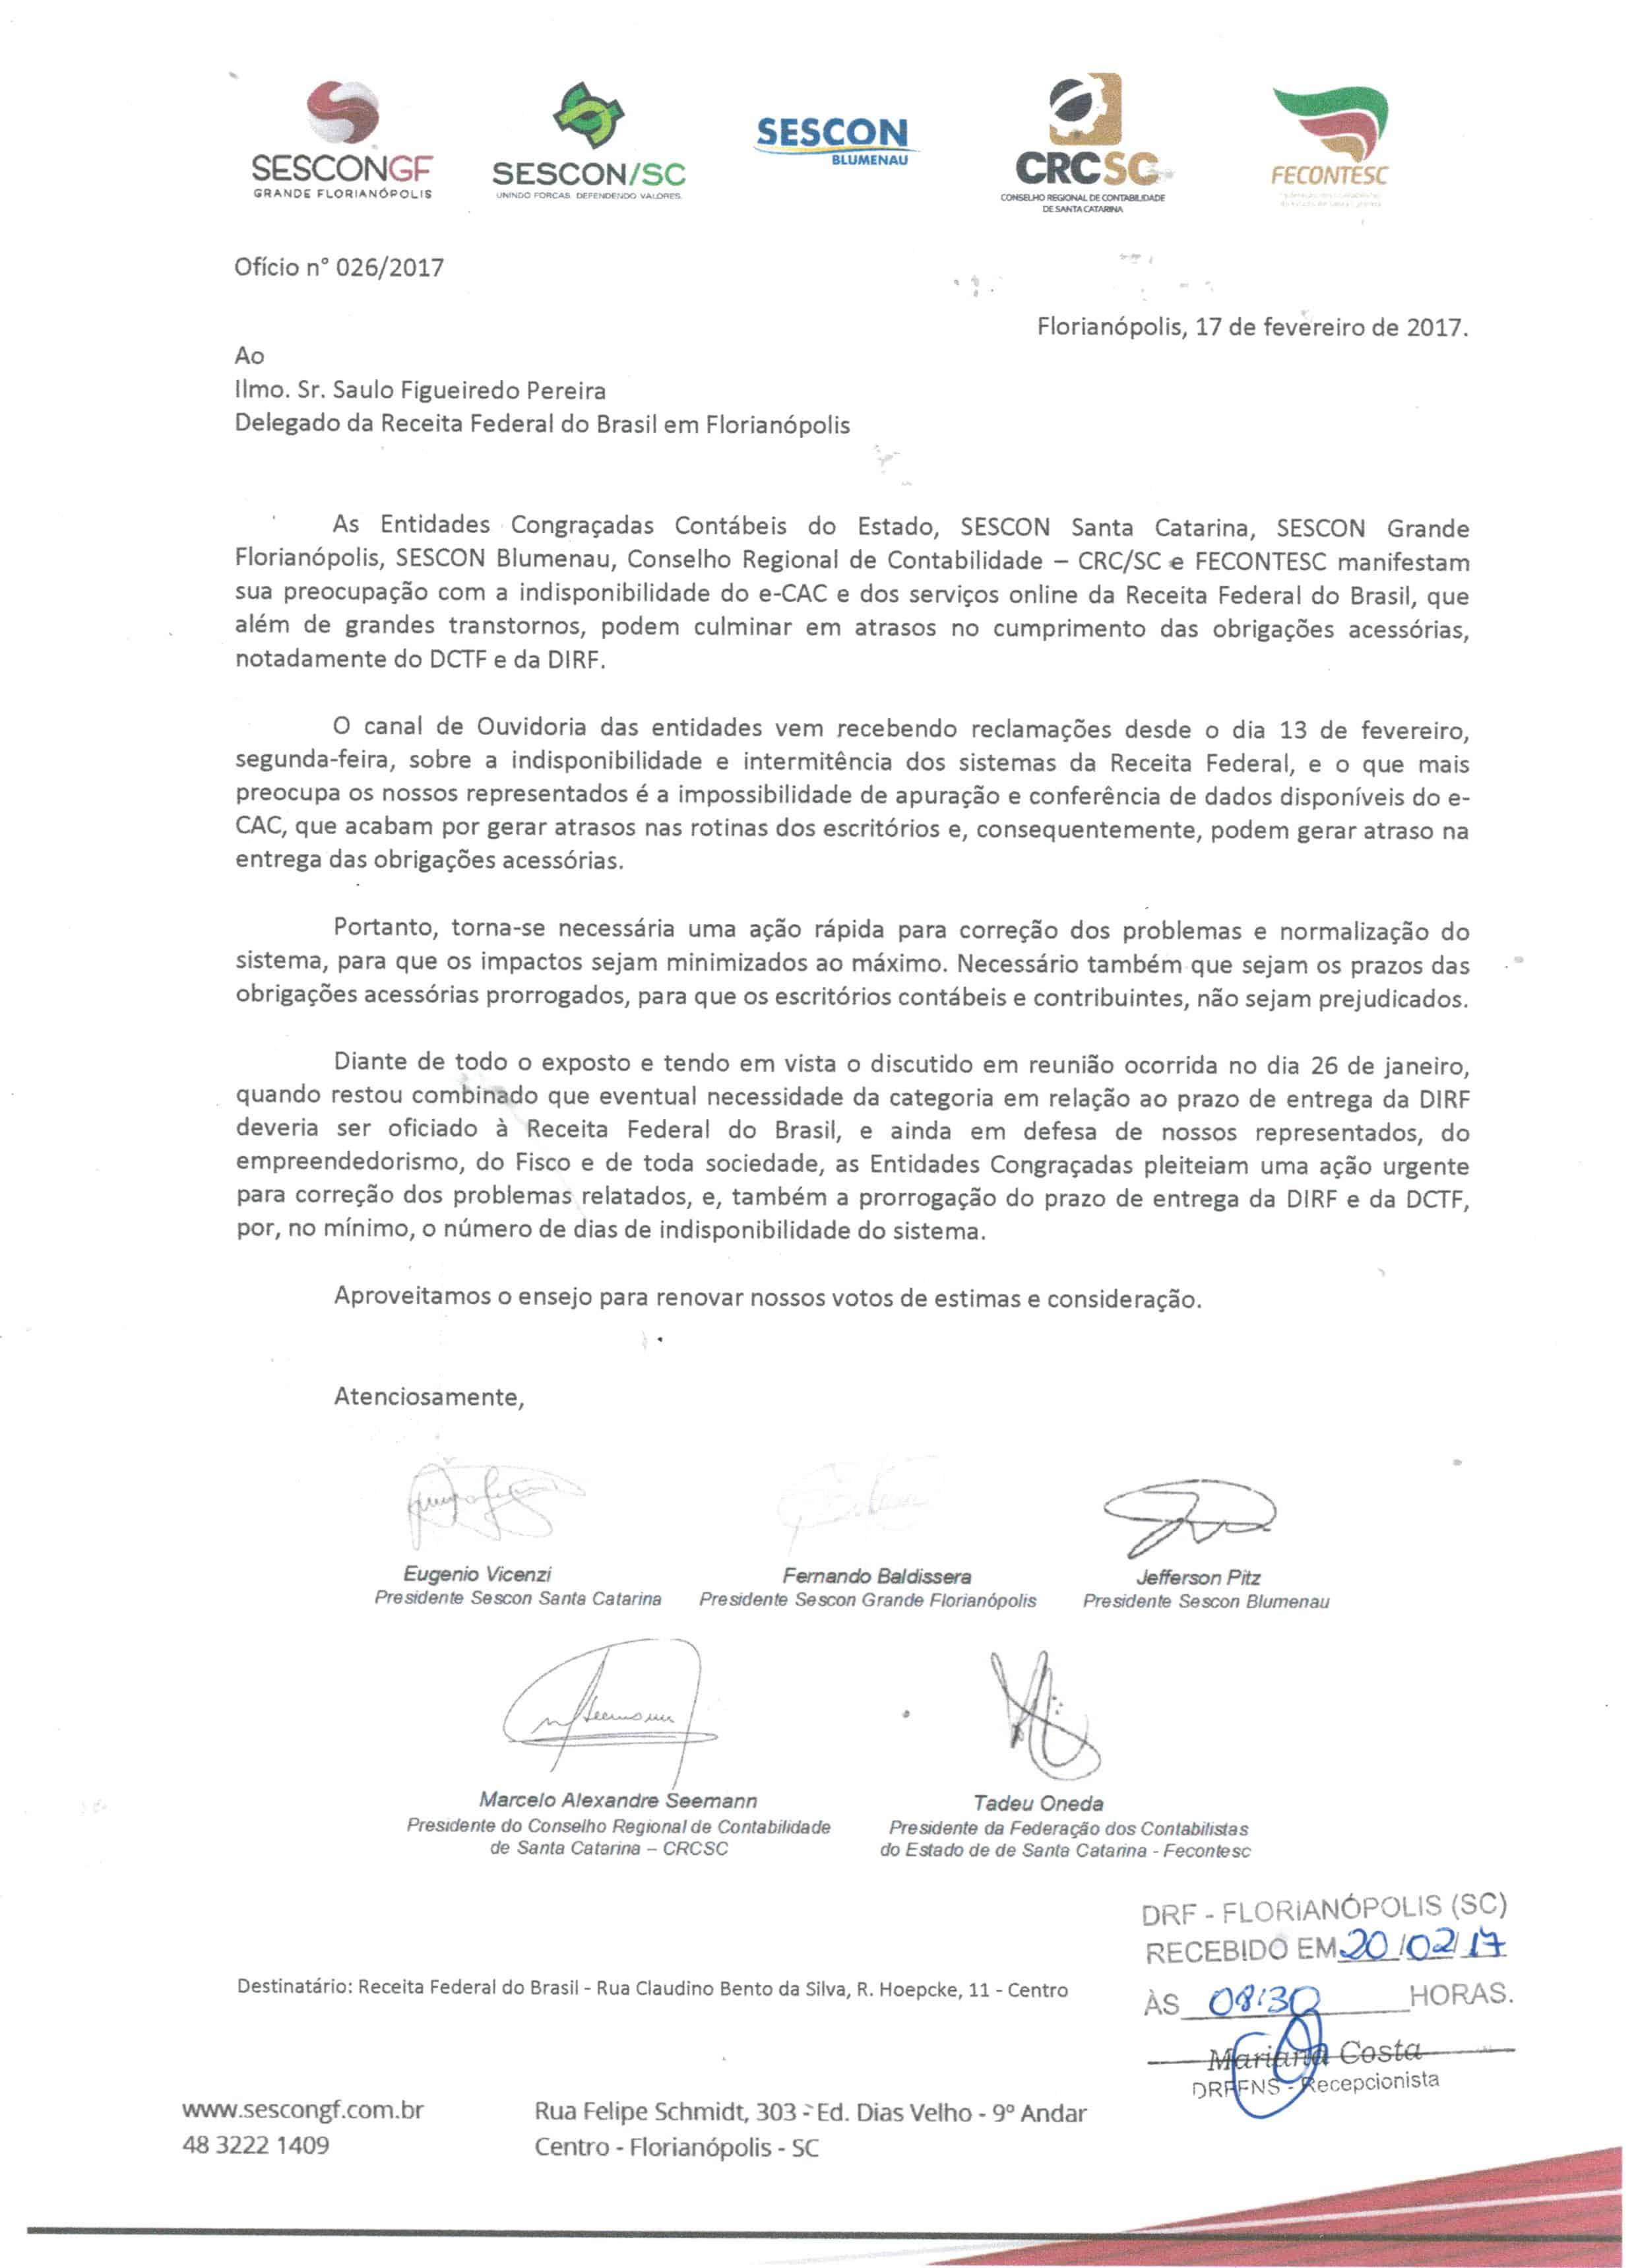 Oficio 026 RBF com protocolo